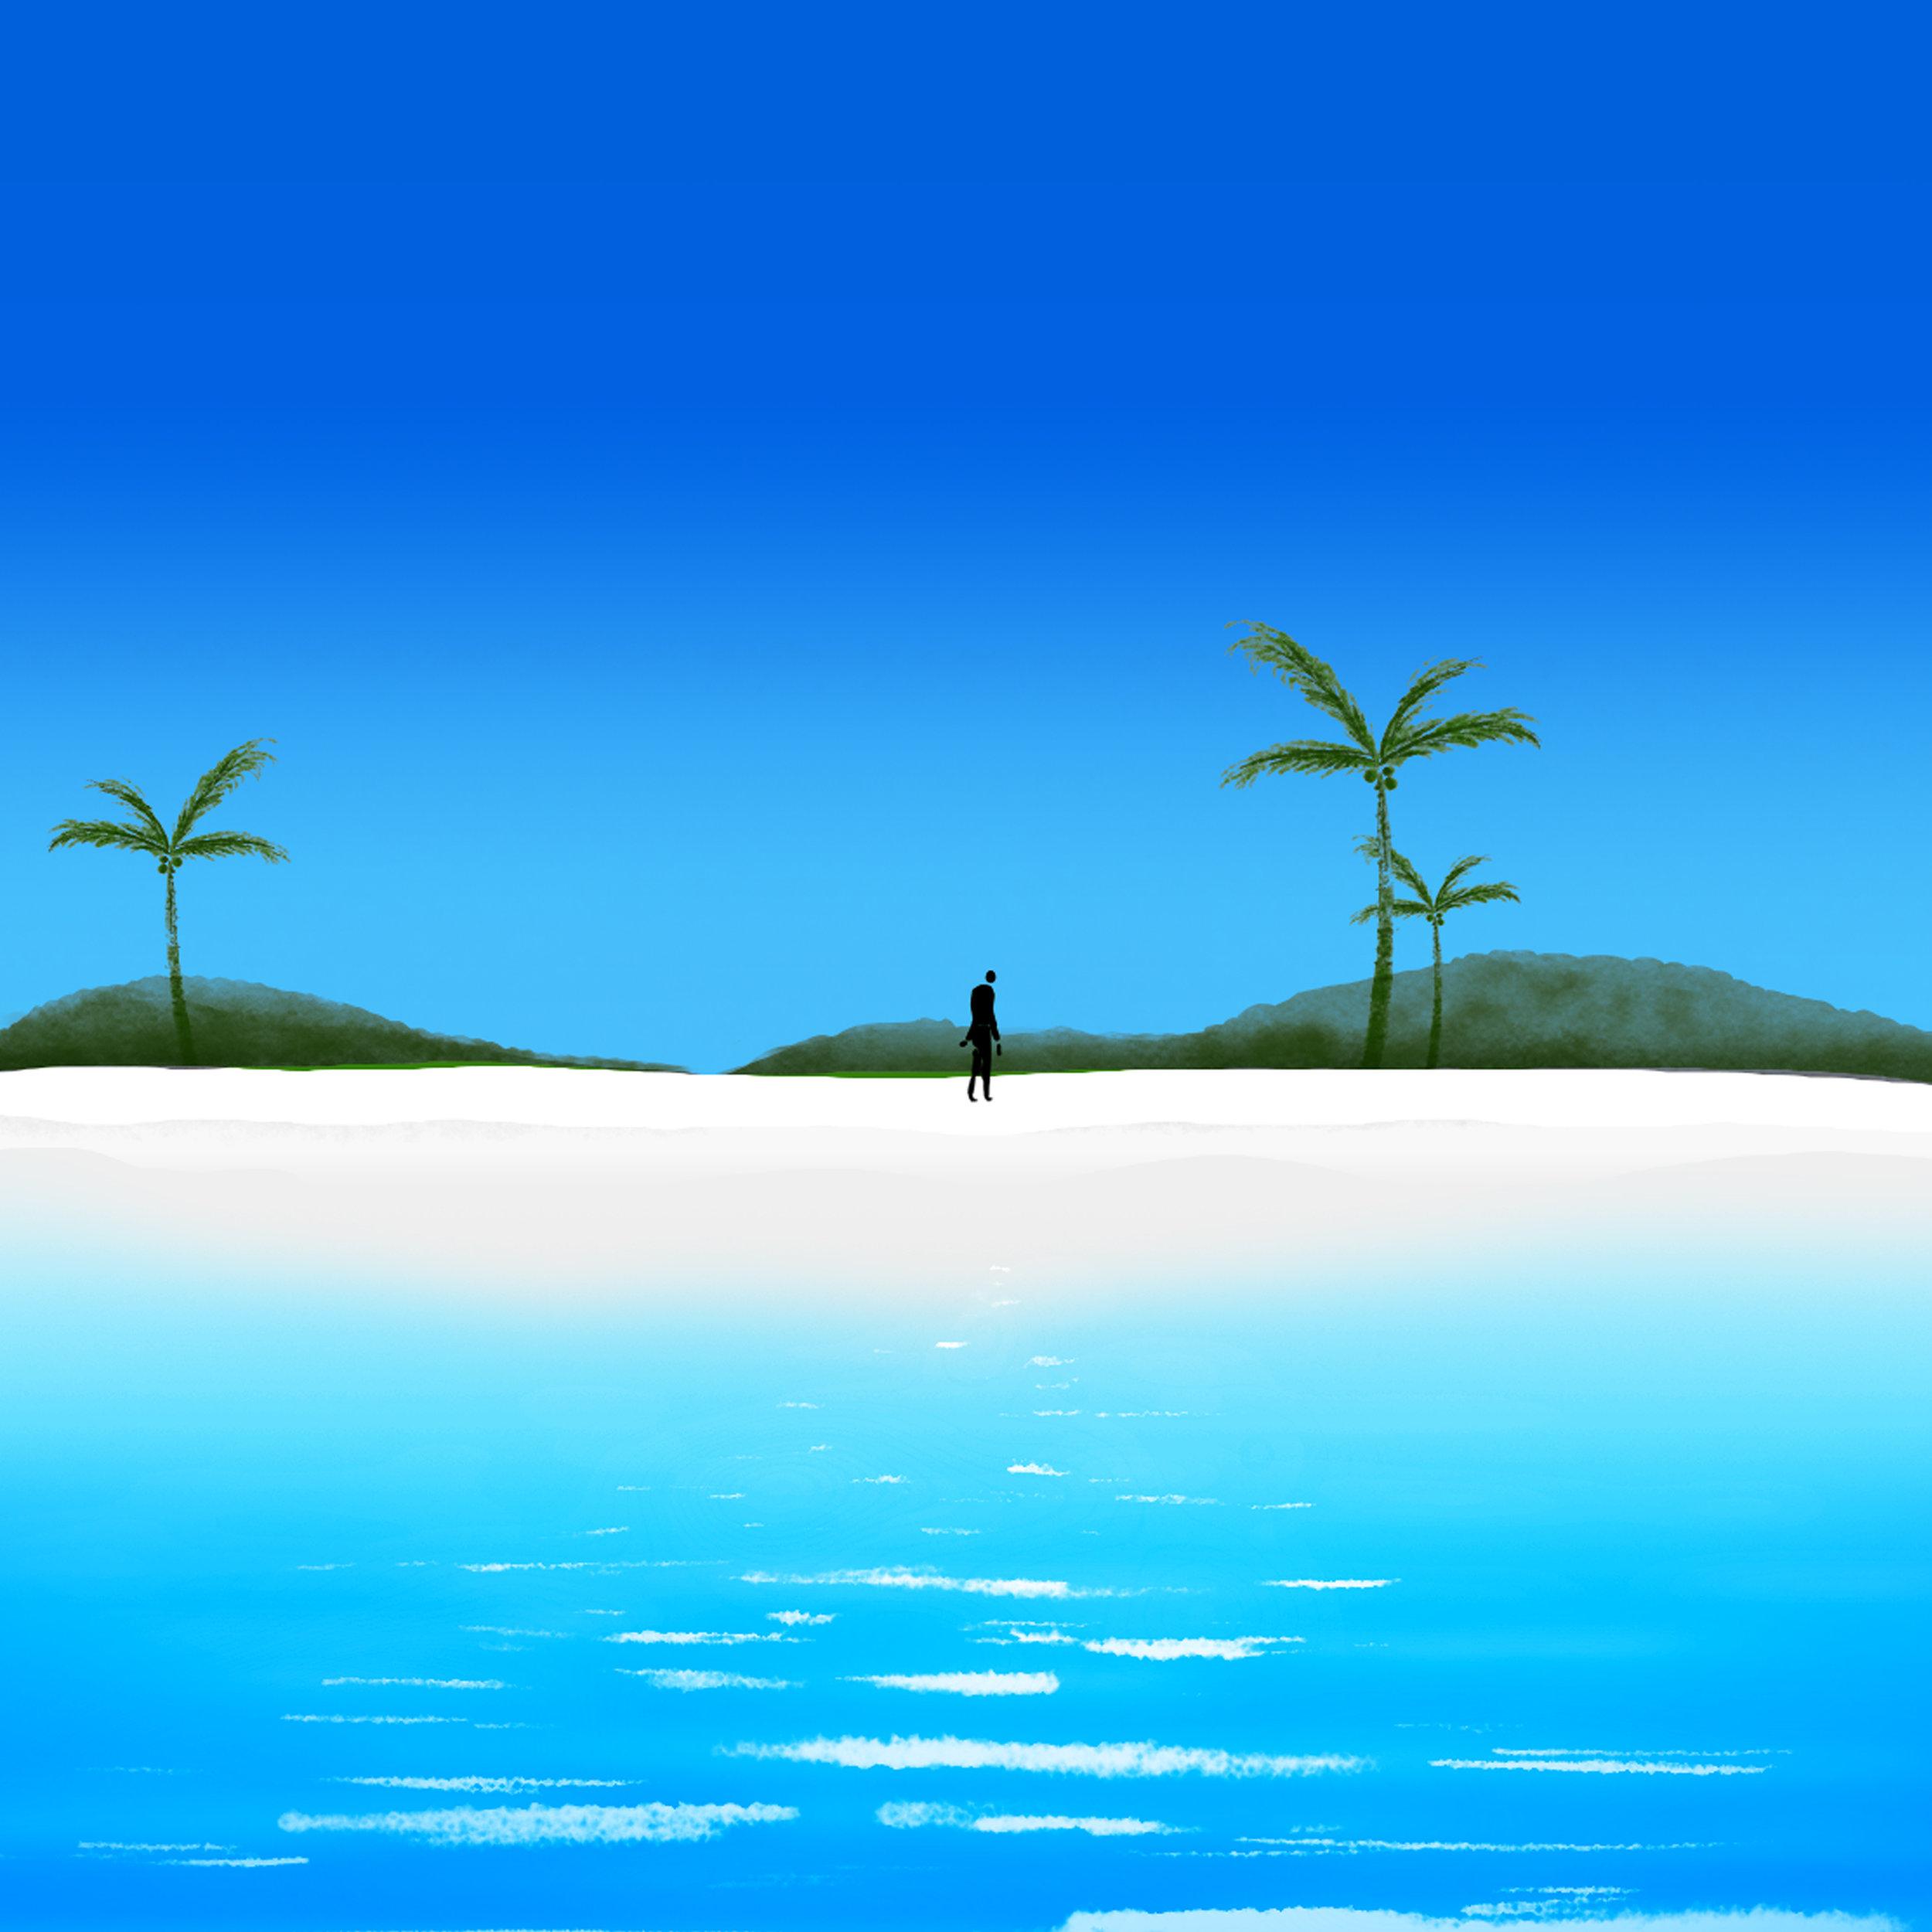 Beach_02Noon.jpg